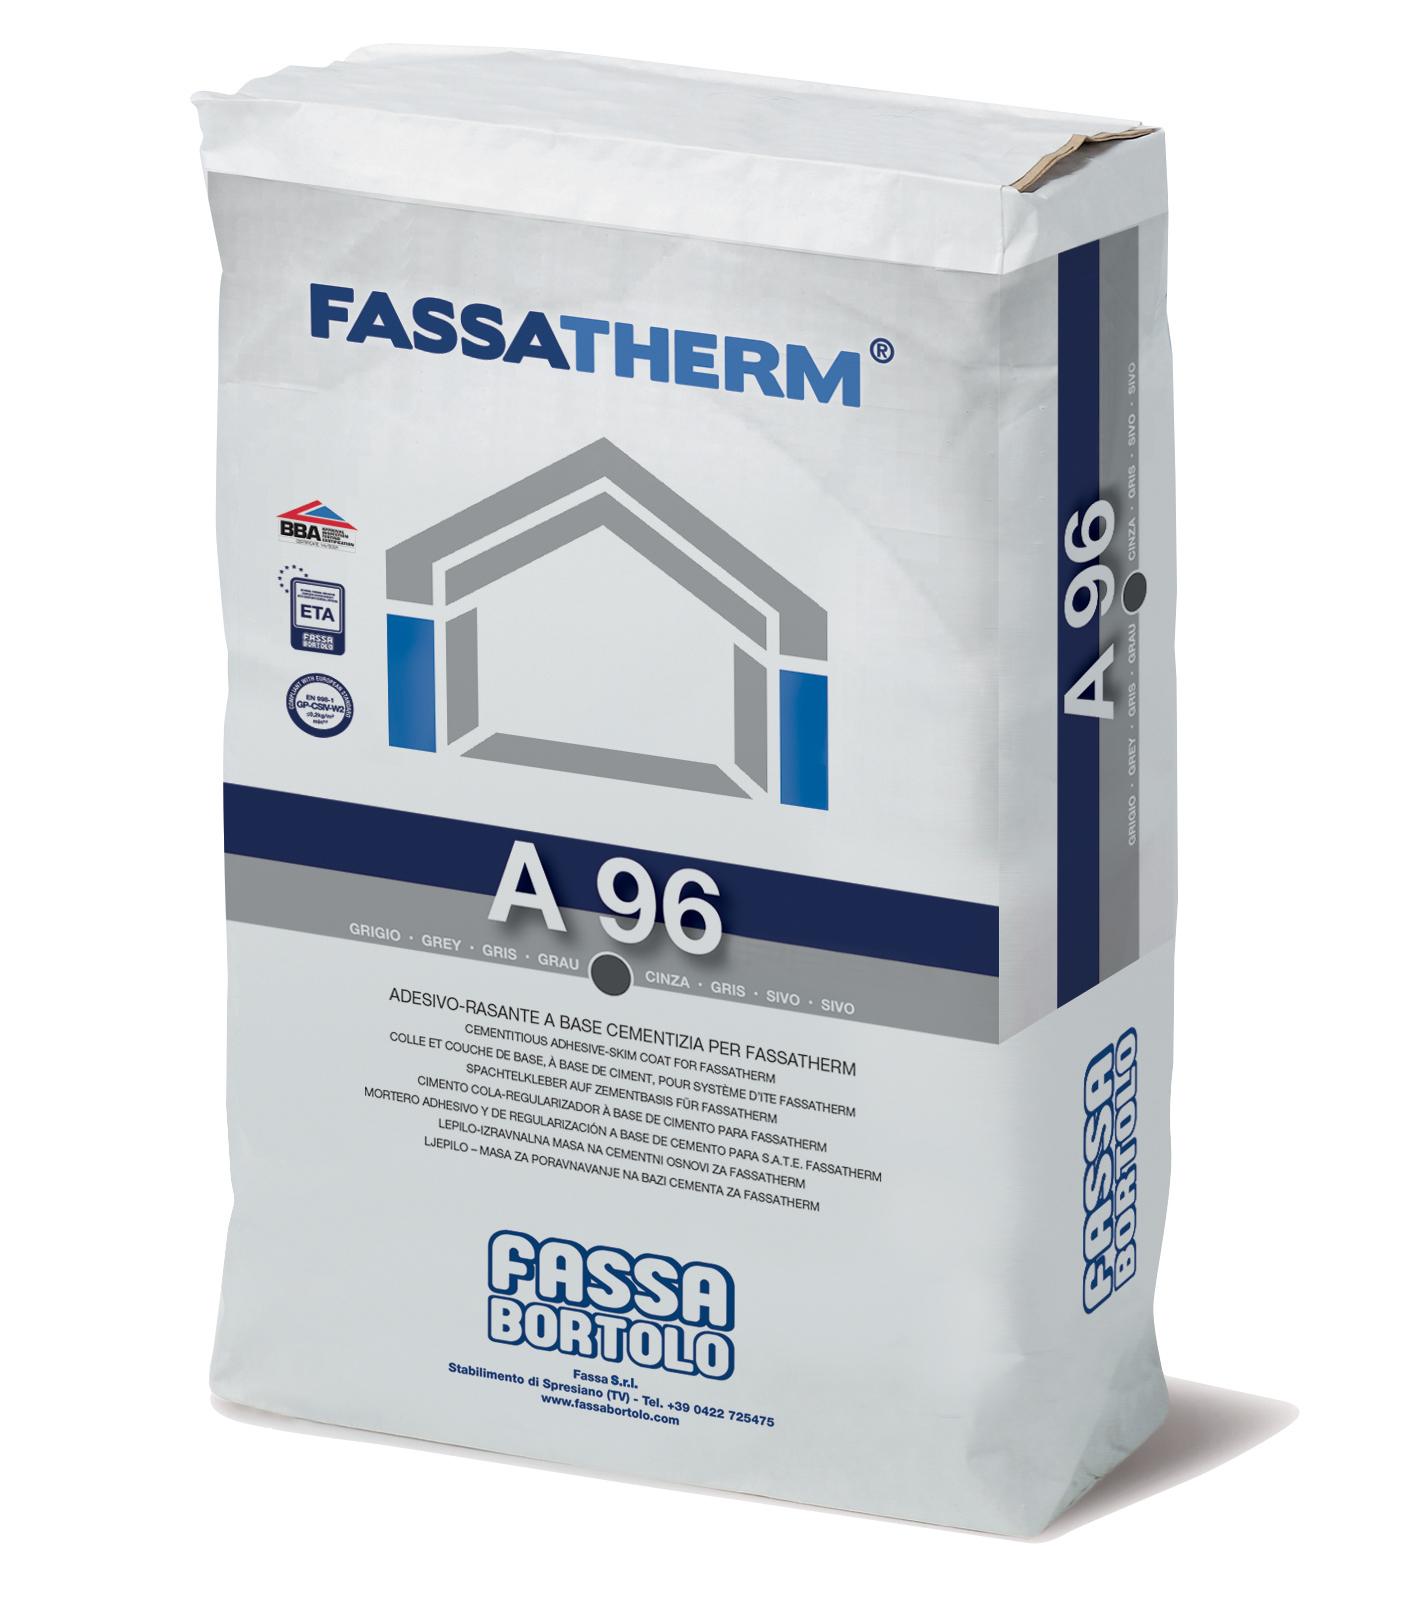 A 96: Cola-Regularizador fibrado de base cimentícia cinzenta e branca para Sistemas Fassatherm®